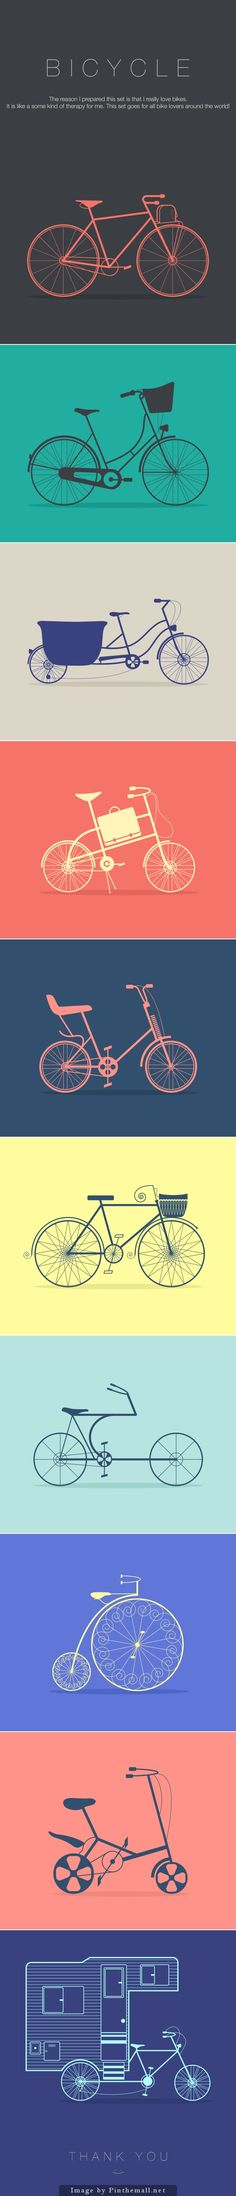 Bike Icon Set                                                                                                                                                      More